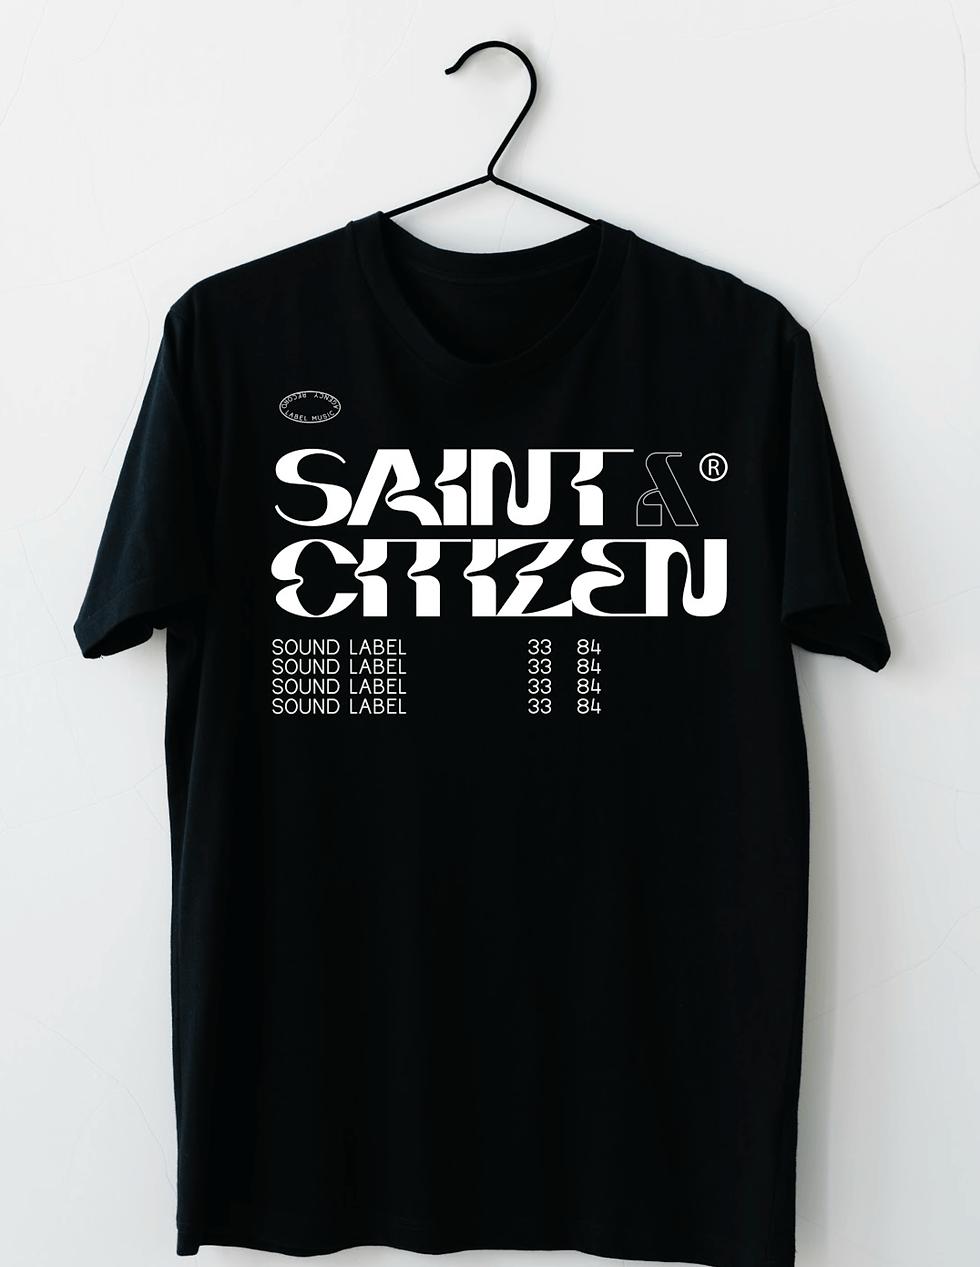 Saint & Citizen Records Branding and Merch Design